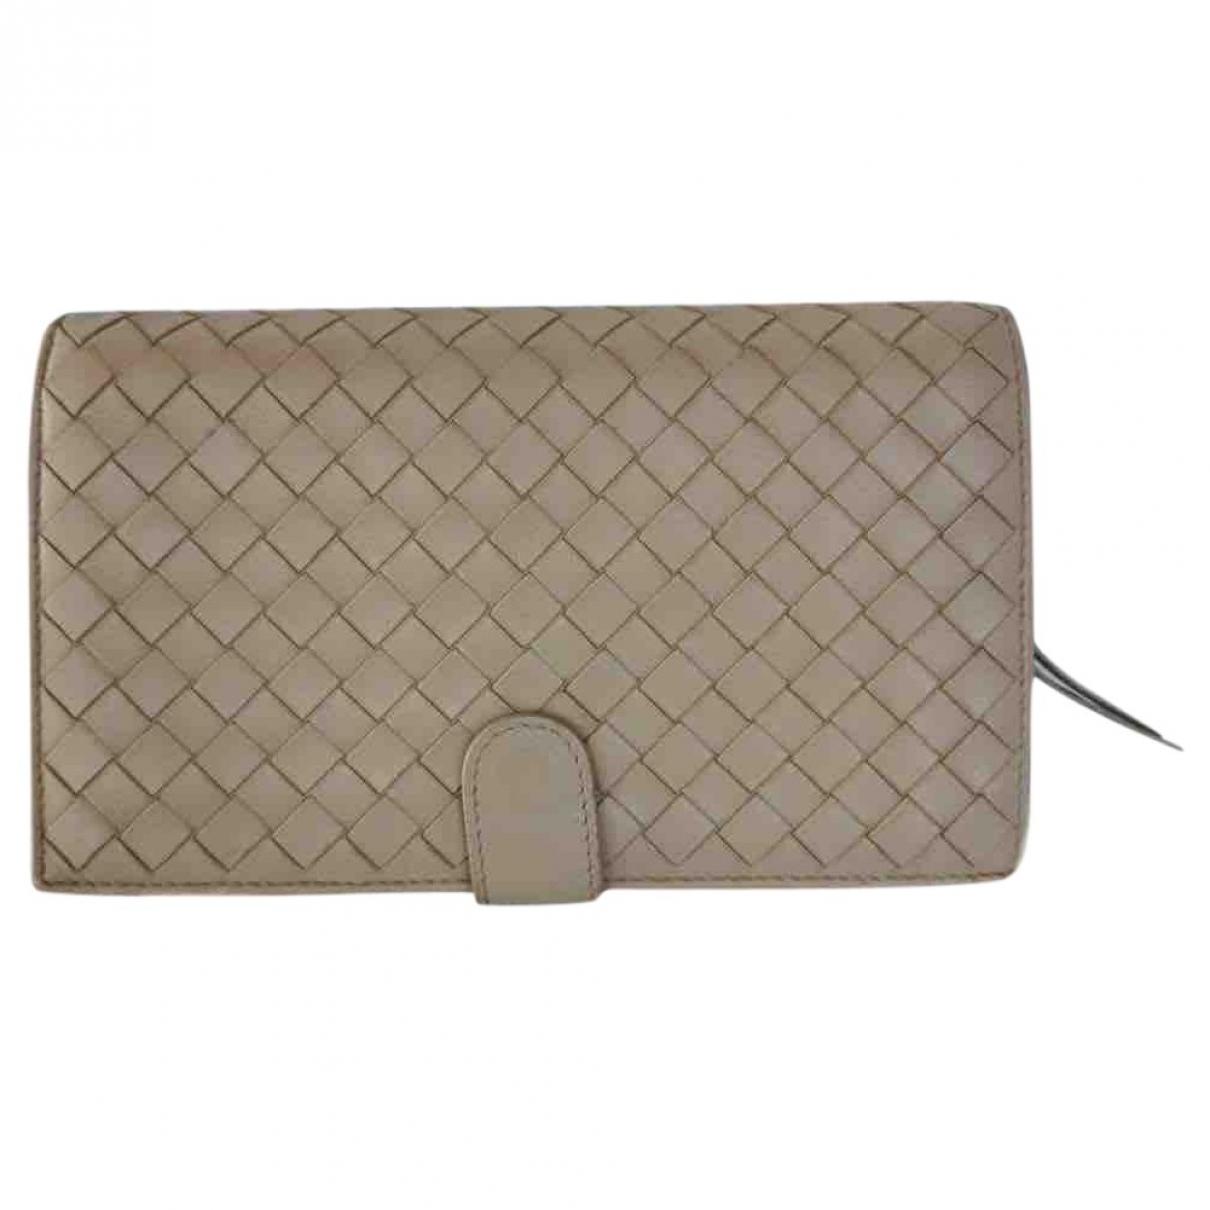 Bottega Veneta - Portefeuille Intrecciato pour femme en cuir - beige